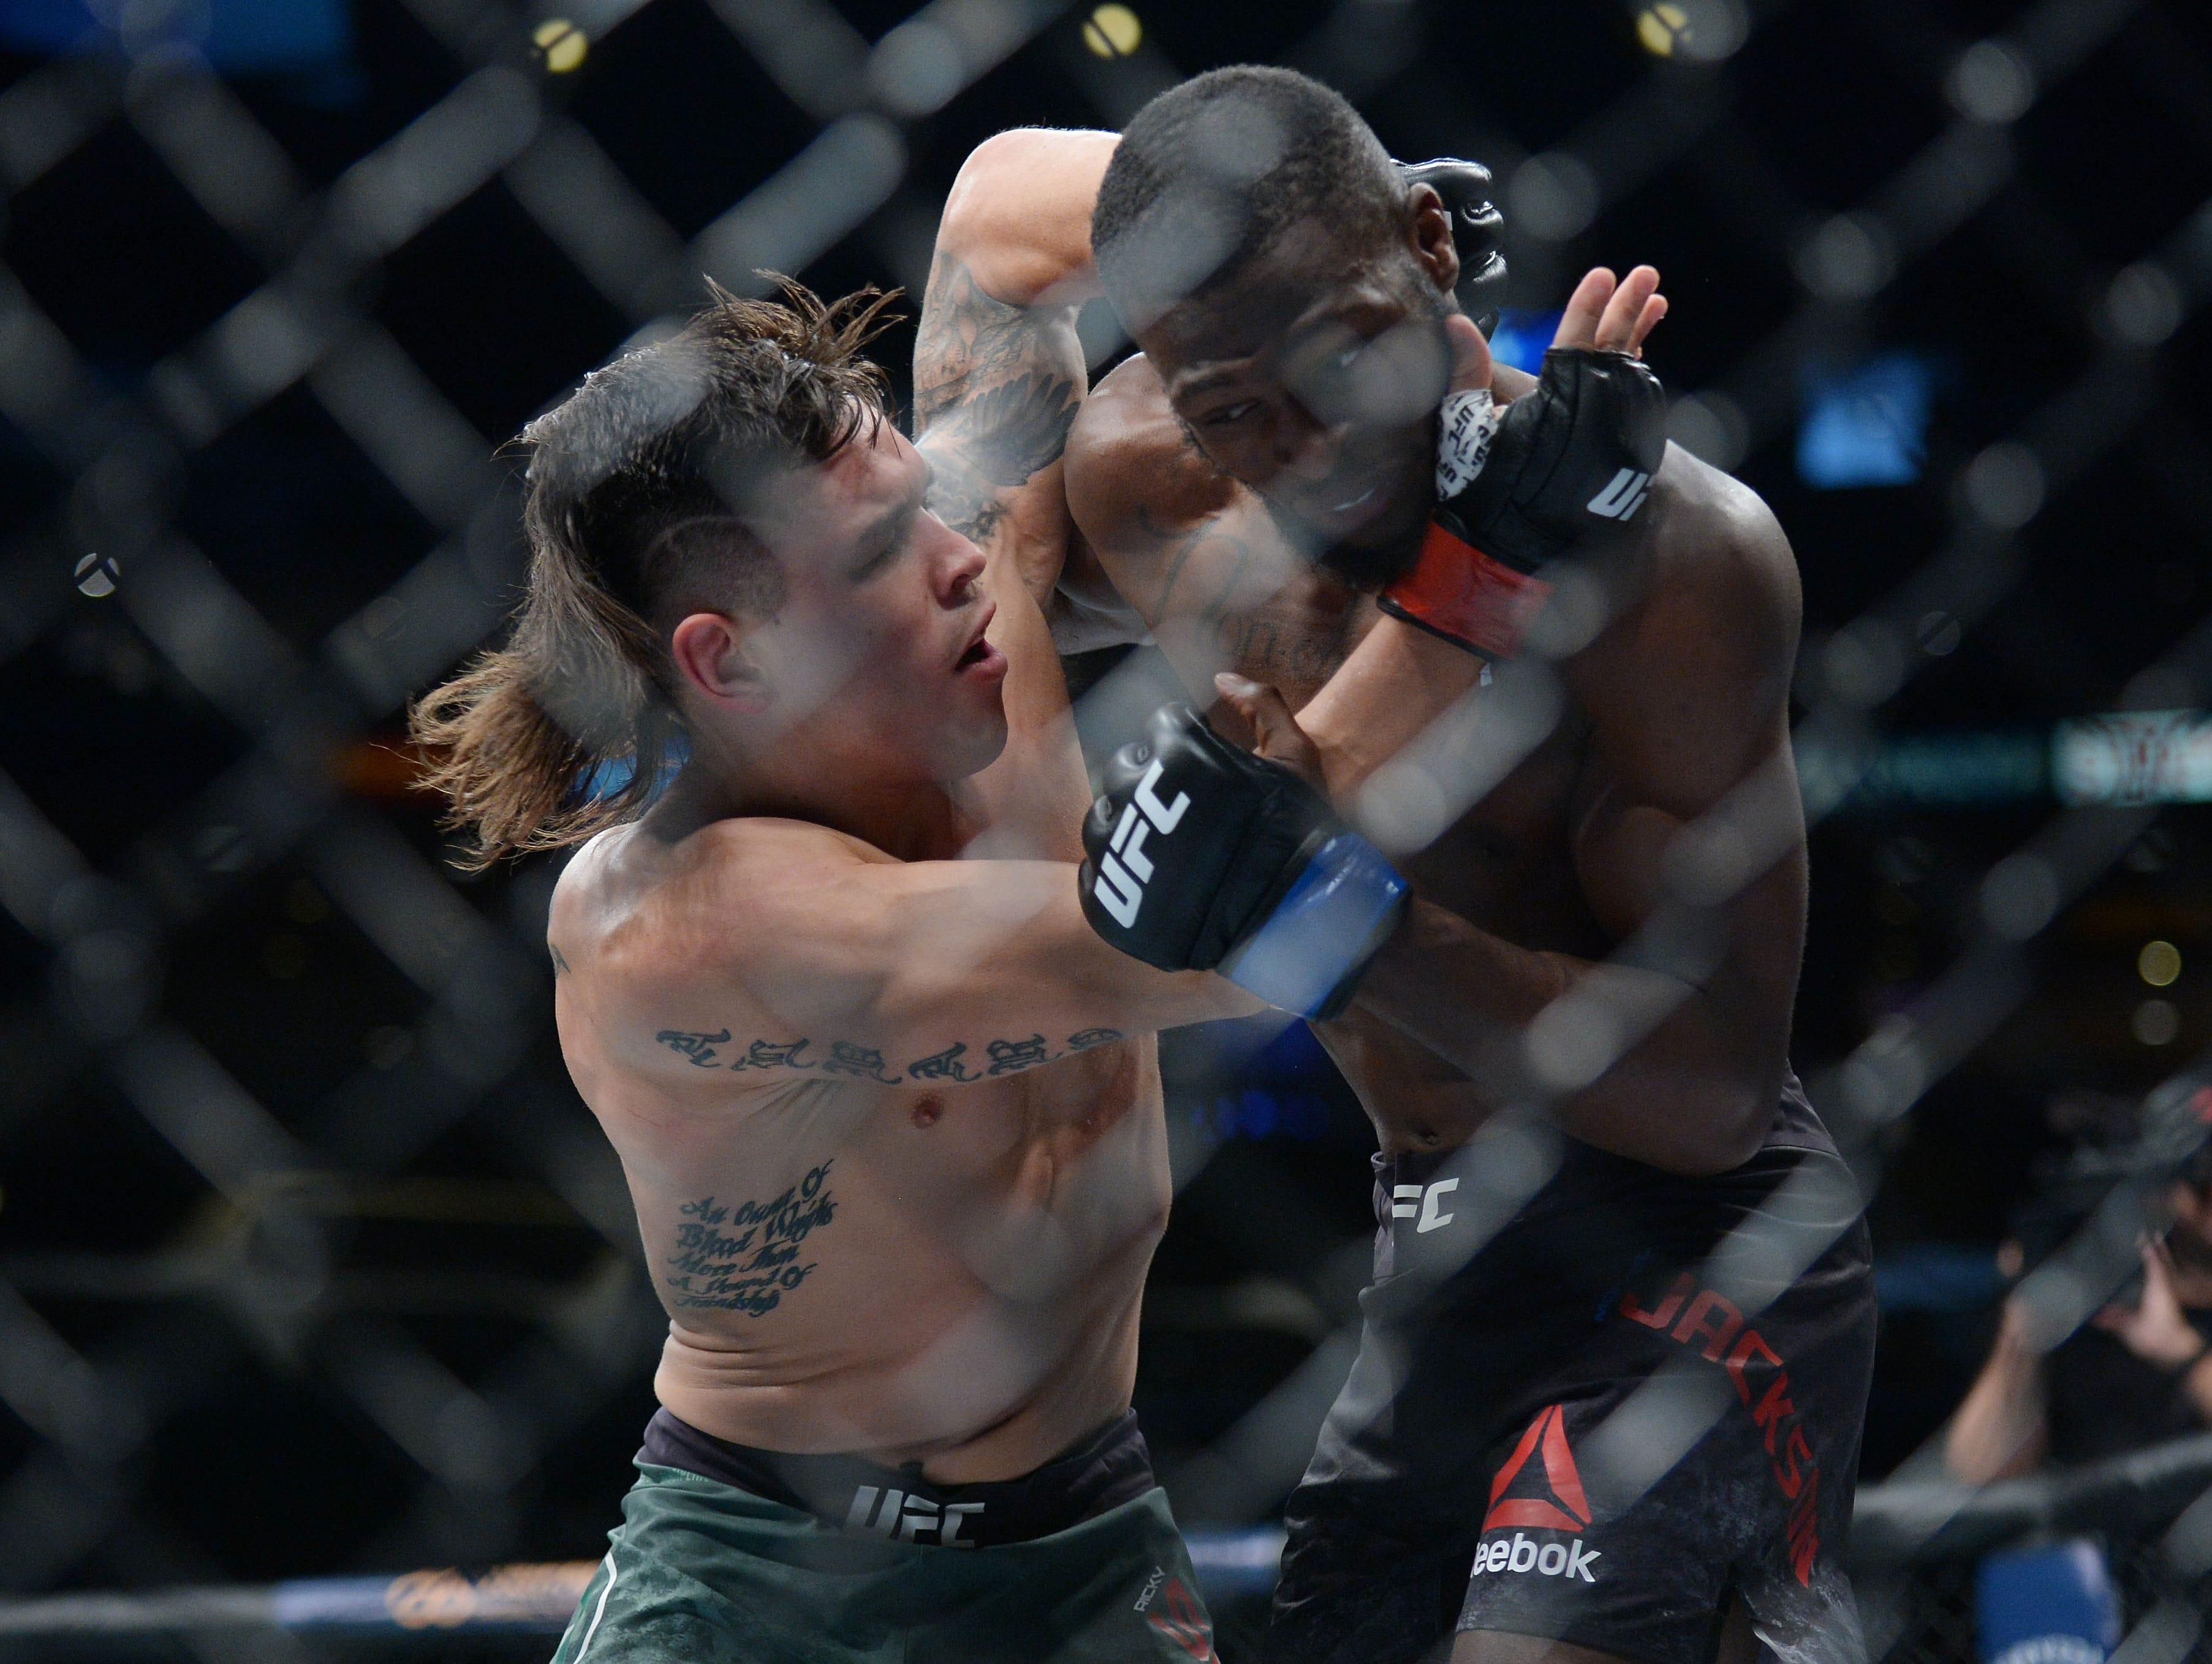 Ricky Simon moves in against Montel Jackson during UFC 227 at Staples Center.